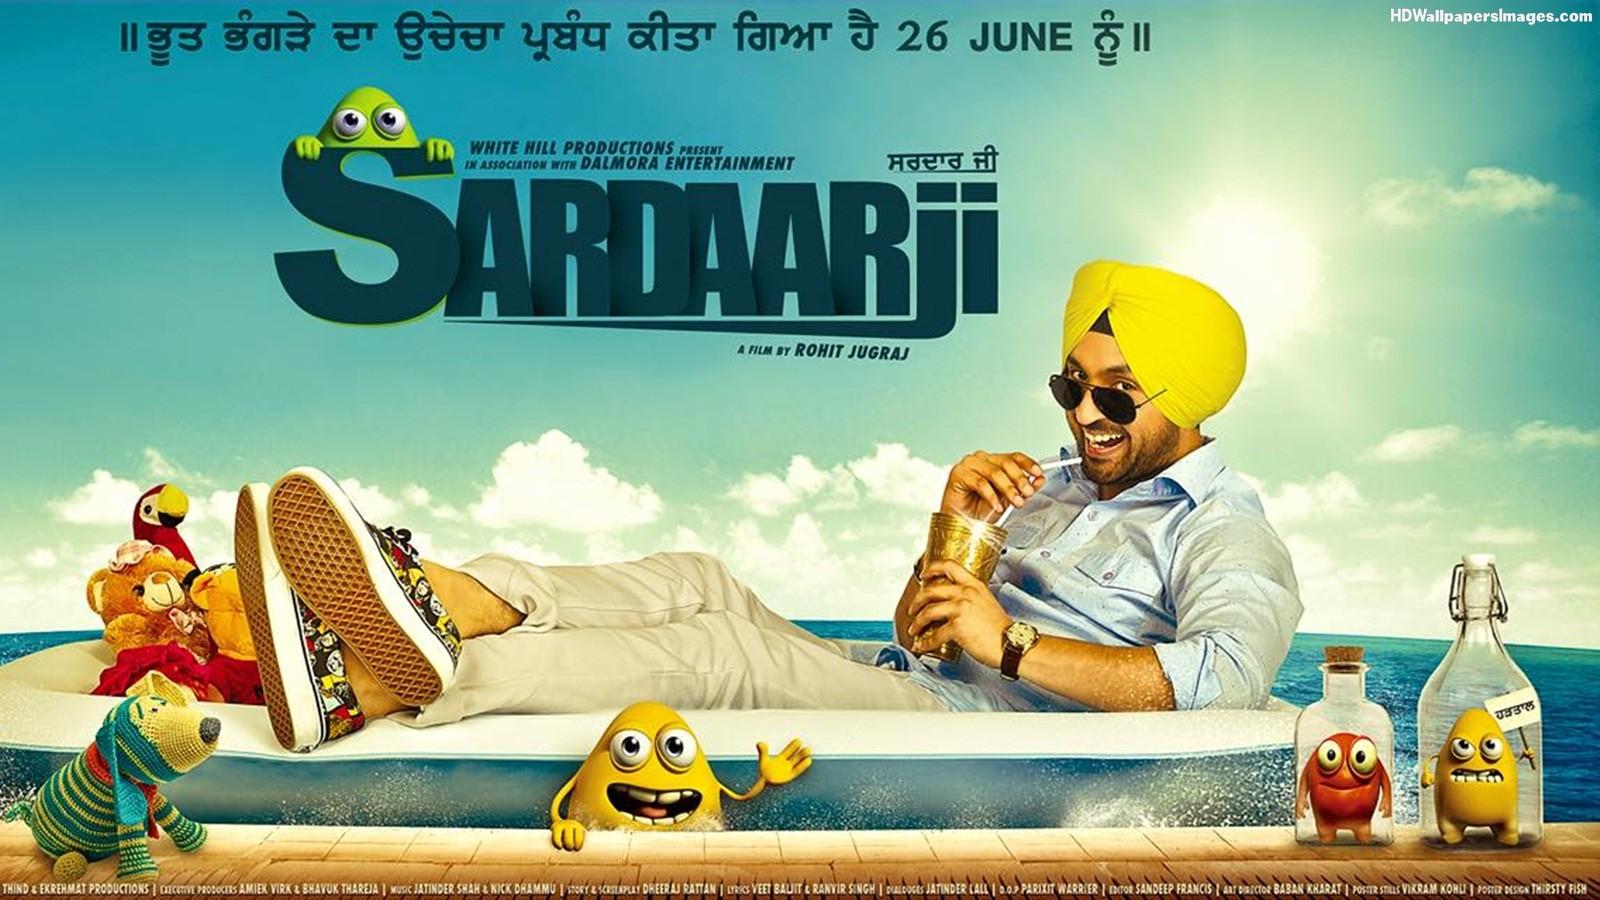 Sardar ji full movie watch online